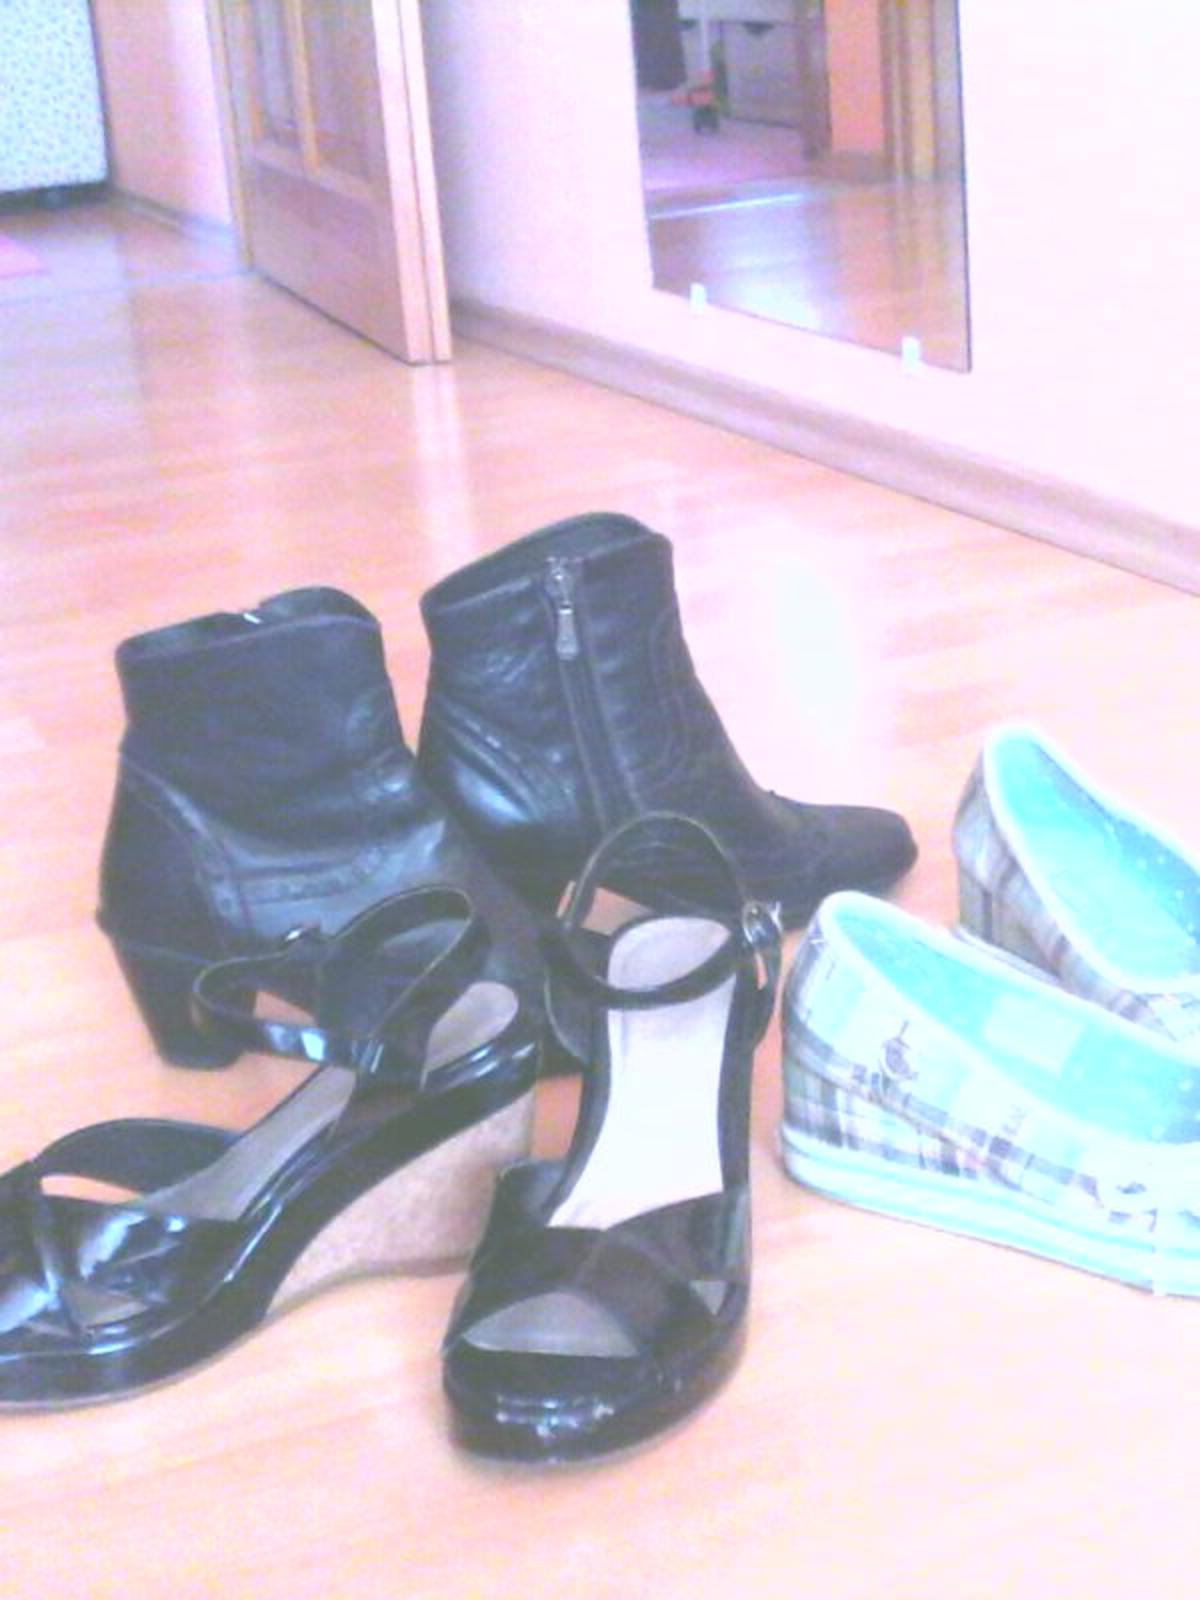 def6d47118 Kis lábú nők - Index Fórum